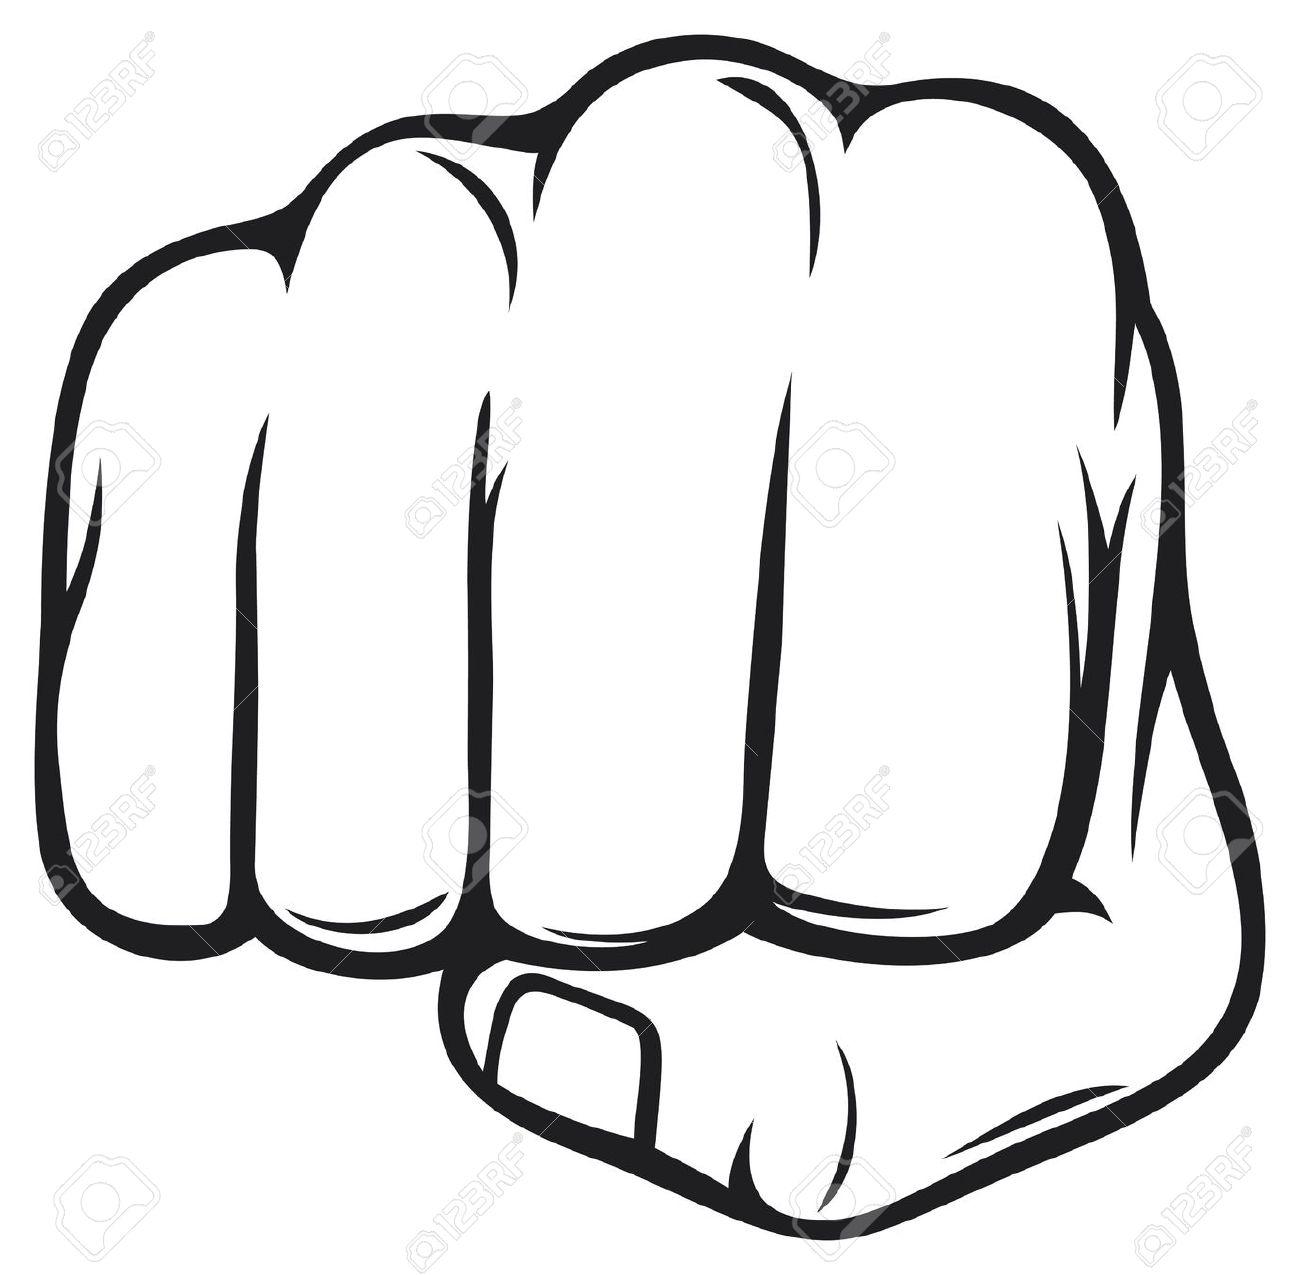 Punch free download best. Fist clipart militant